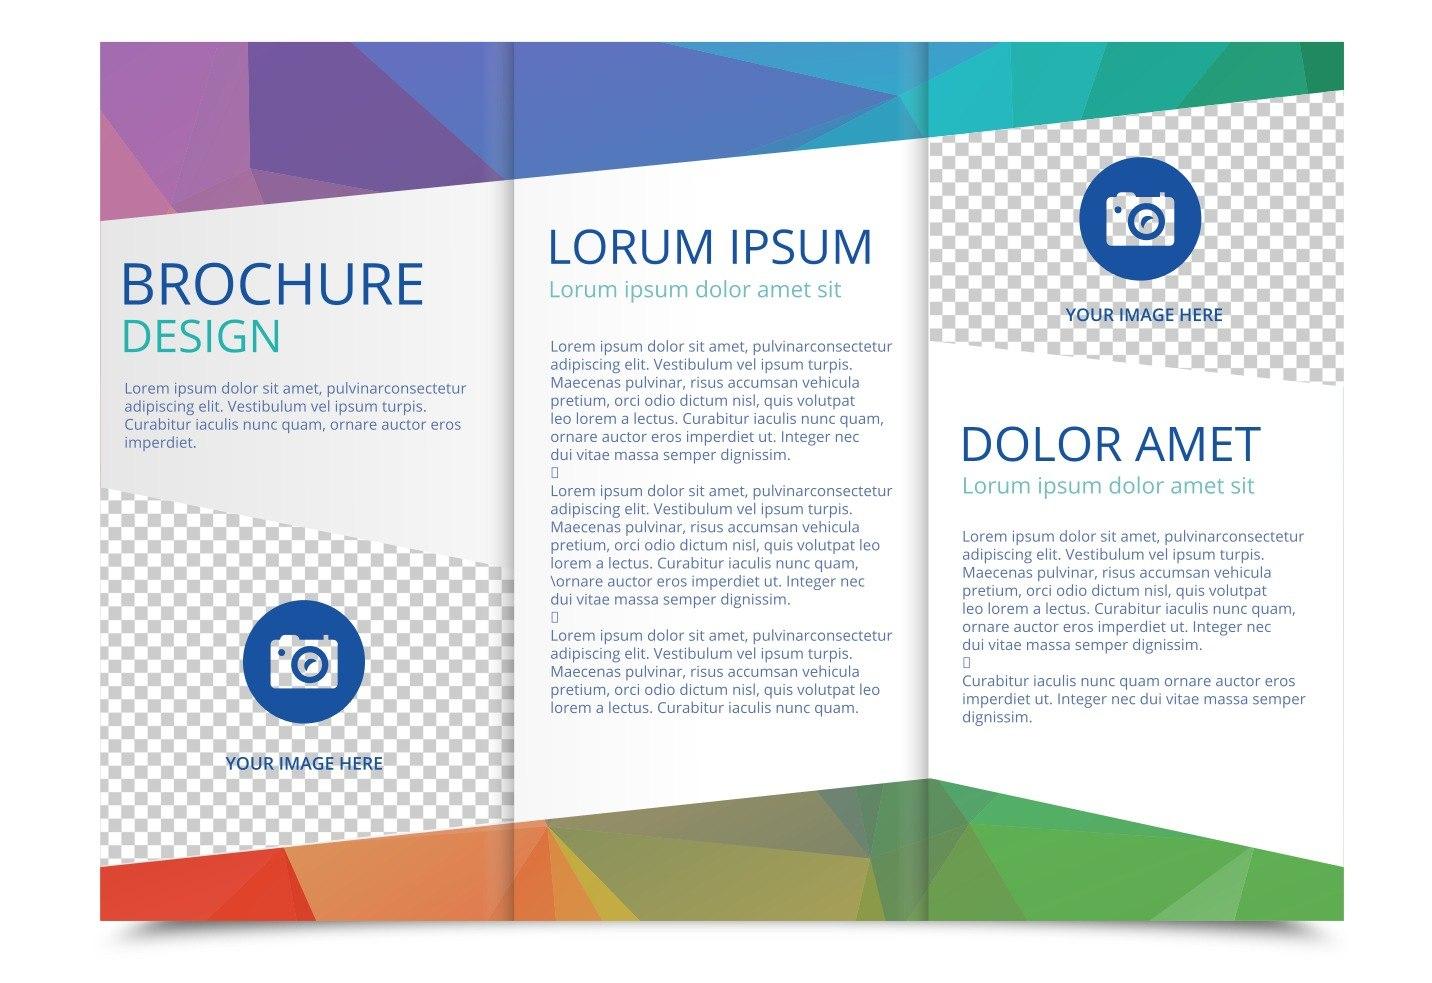 Tri Fold Brochure Vector Template  Download Free Vector Art Stock For Free Three Fold Brochure Template